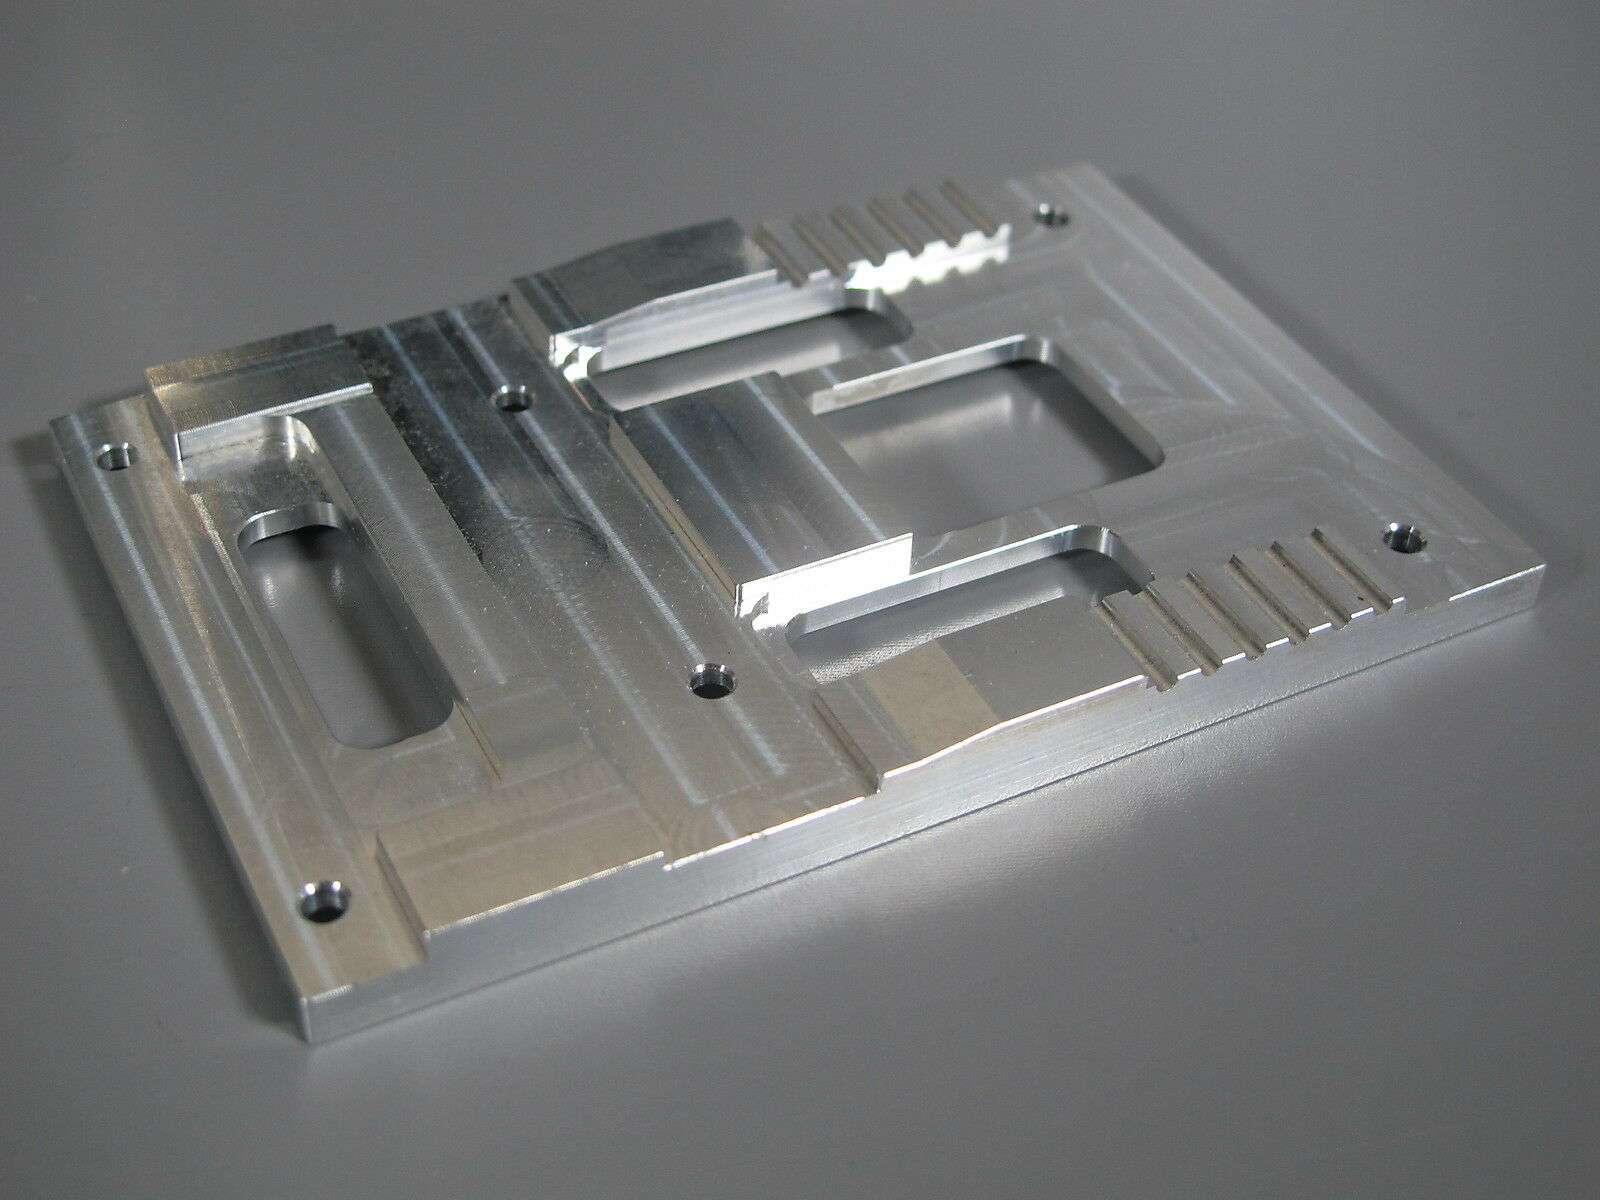 Aluminum Fifth Wheel Coupling A A A Mount Plate Tamiya 1 14 King Knight Grand Hauler 04cb46